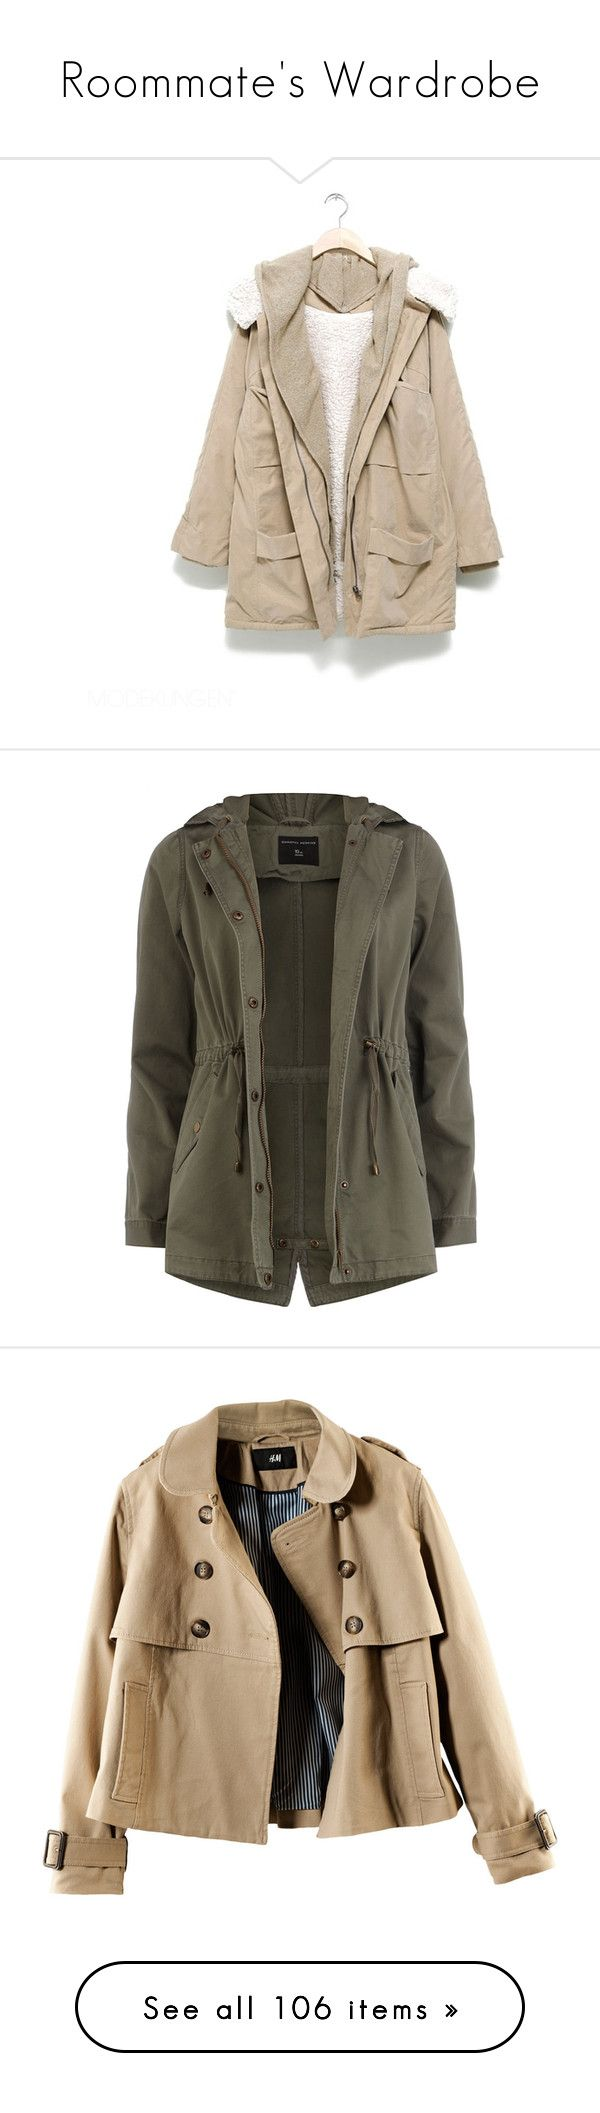 """Roommate's Wardrobe"" by phoebe-5sos ❤ liked on Polyvore featuring outerwear, jackets, coats, tops, women, cotton jacket, pink jacket, khaki, khaki parka and khaki jacket"